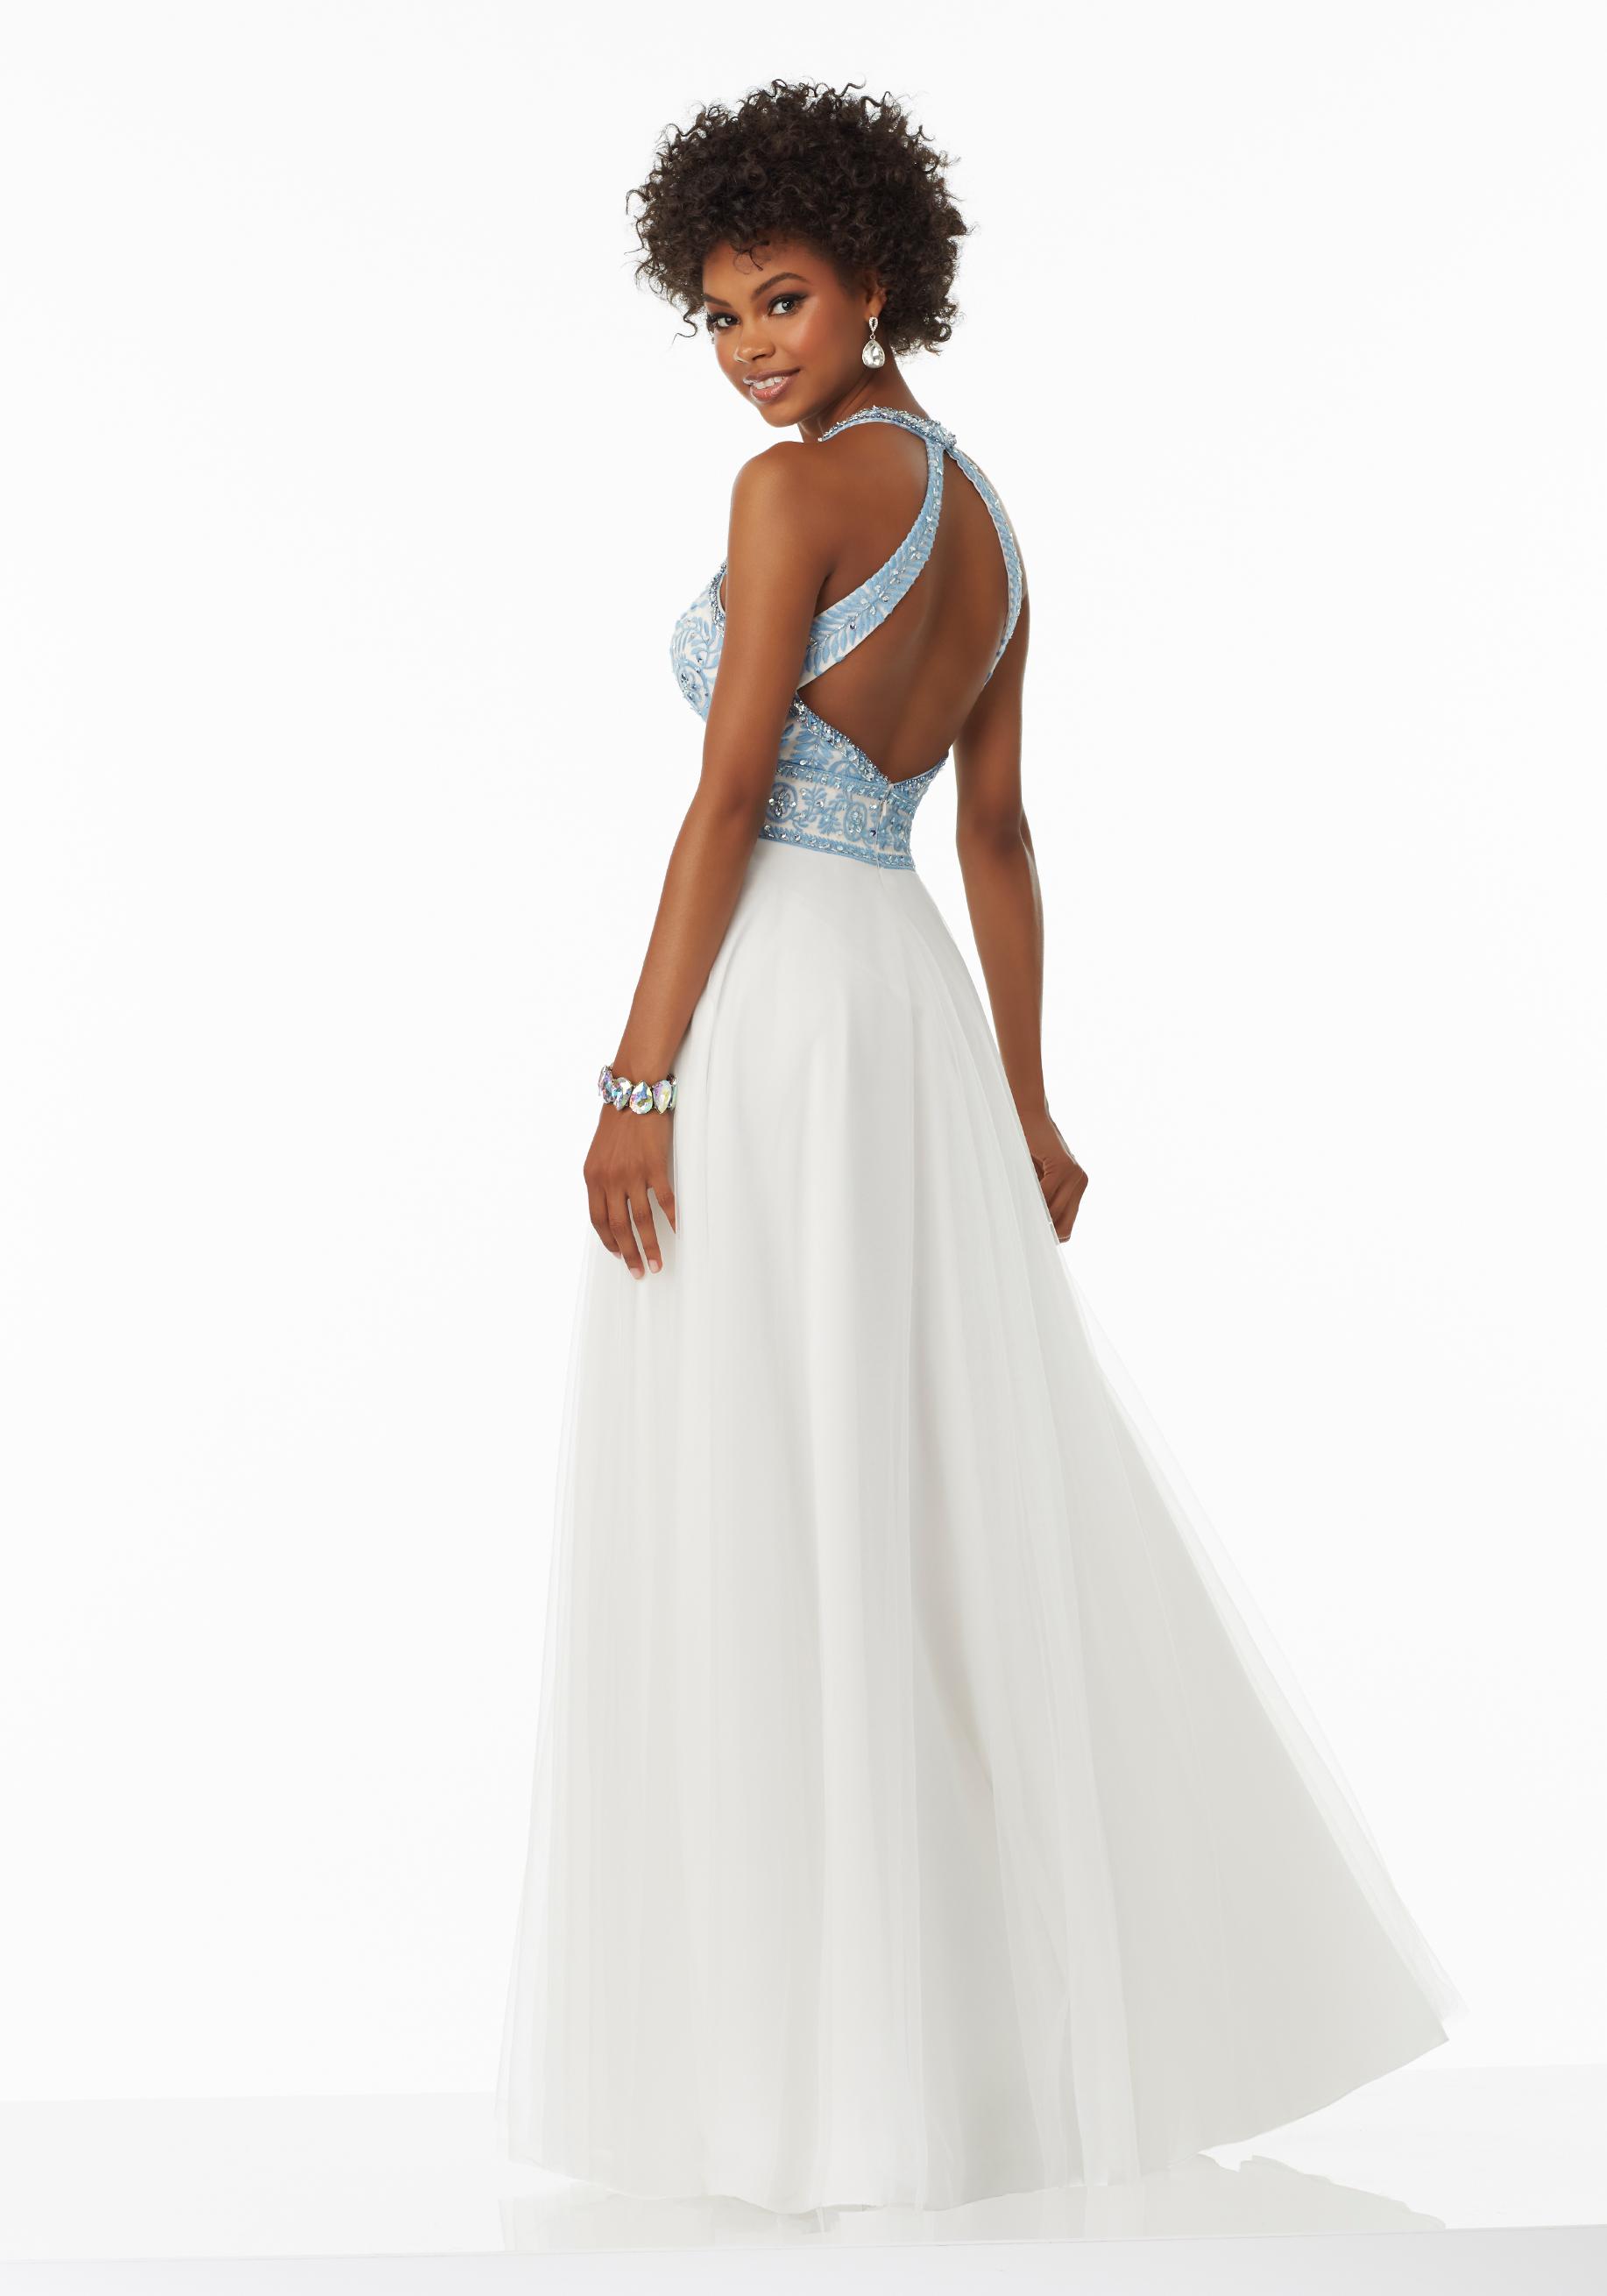 wedding dresses with halter neckline photo - 1